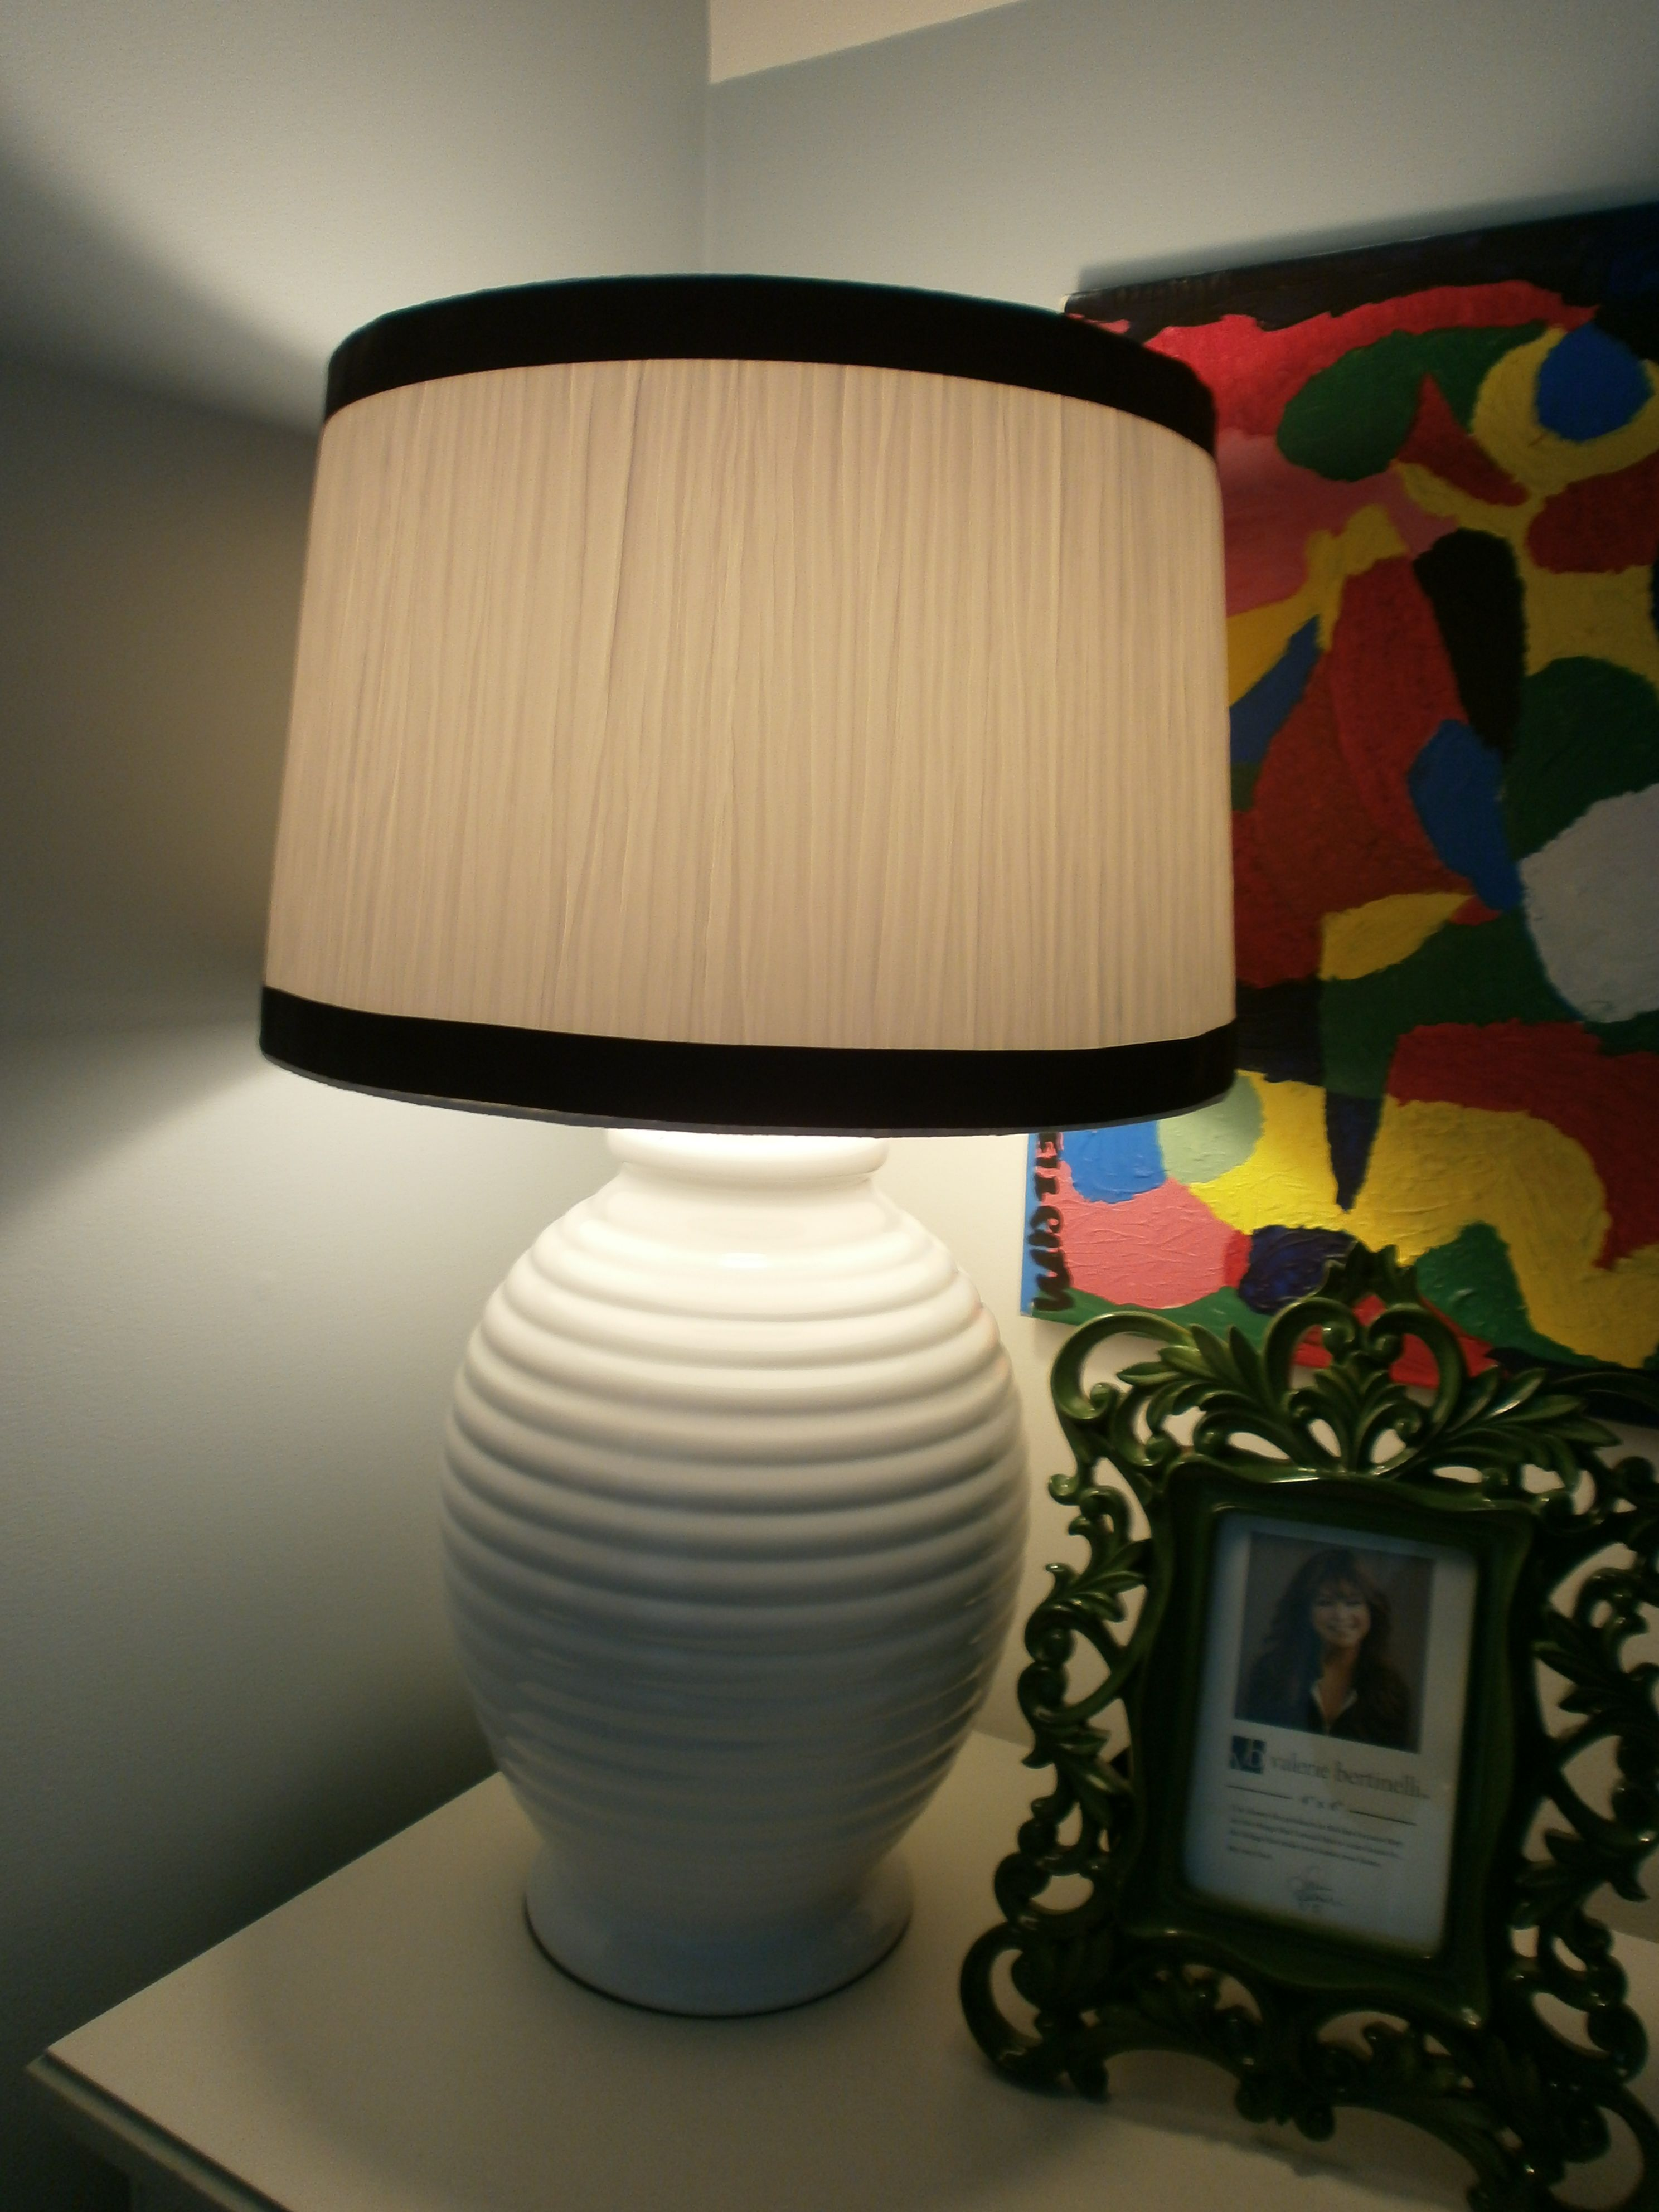 Adding trim to lamp shades diy trim to shades diy projects by adding trim to lamp shades diy trim to shades diy projects by amber b interiors lamps aloadofball Gallery